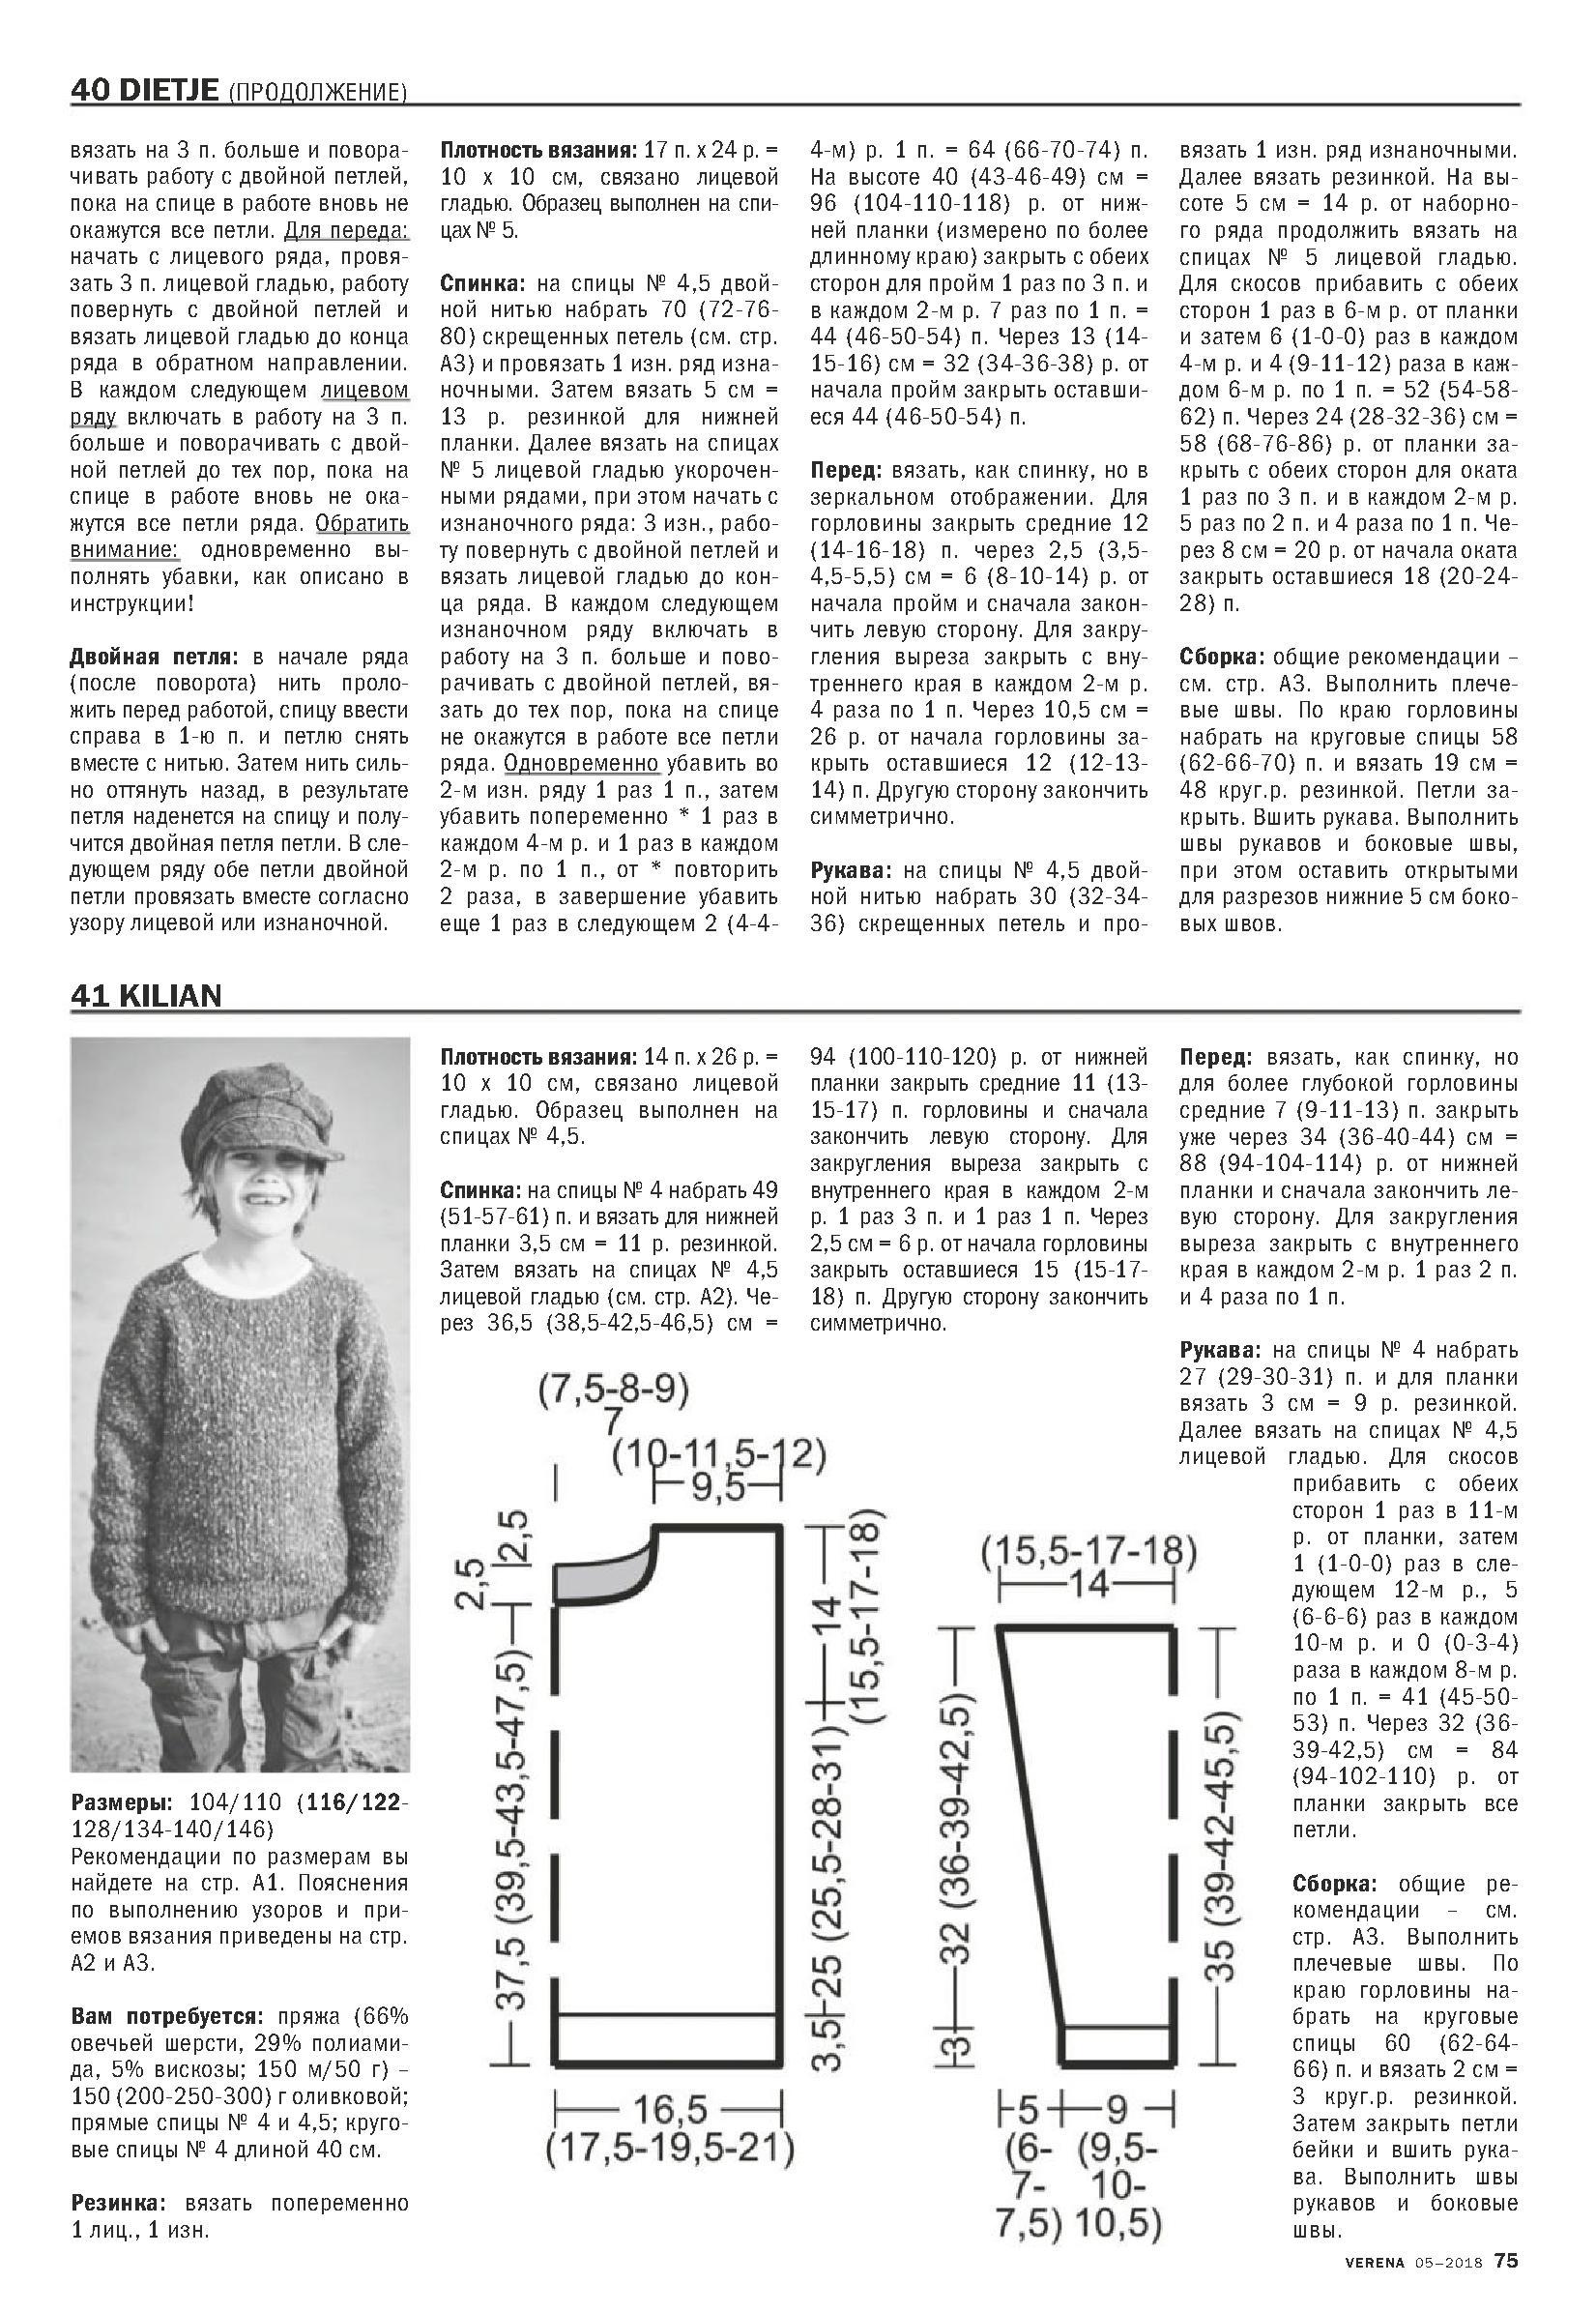 Page_00076.jpg